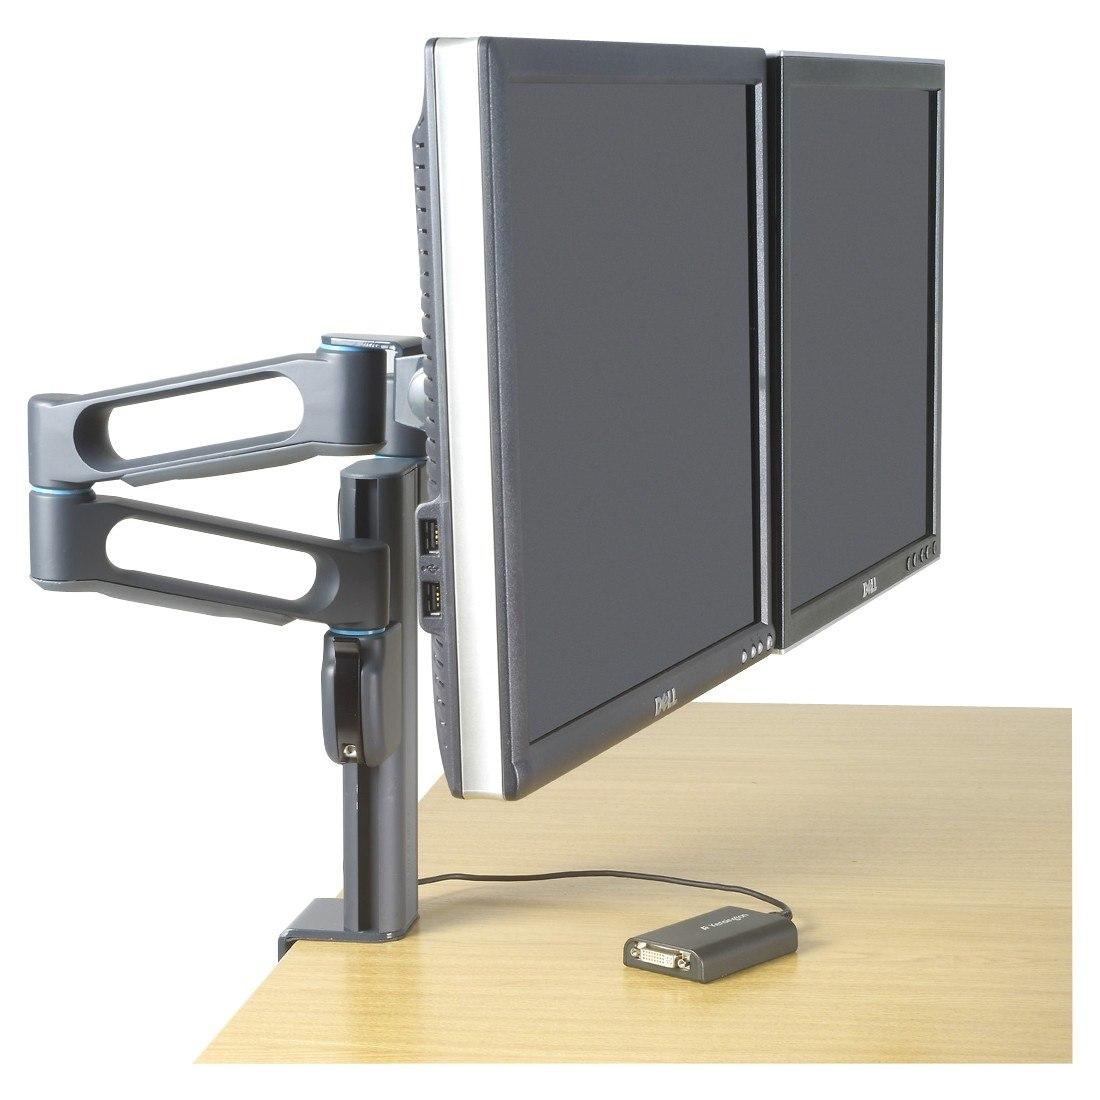 Kensington SmartFit 60900 Mounting Arm for Flat Panel Display, Notebook